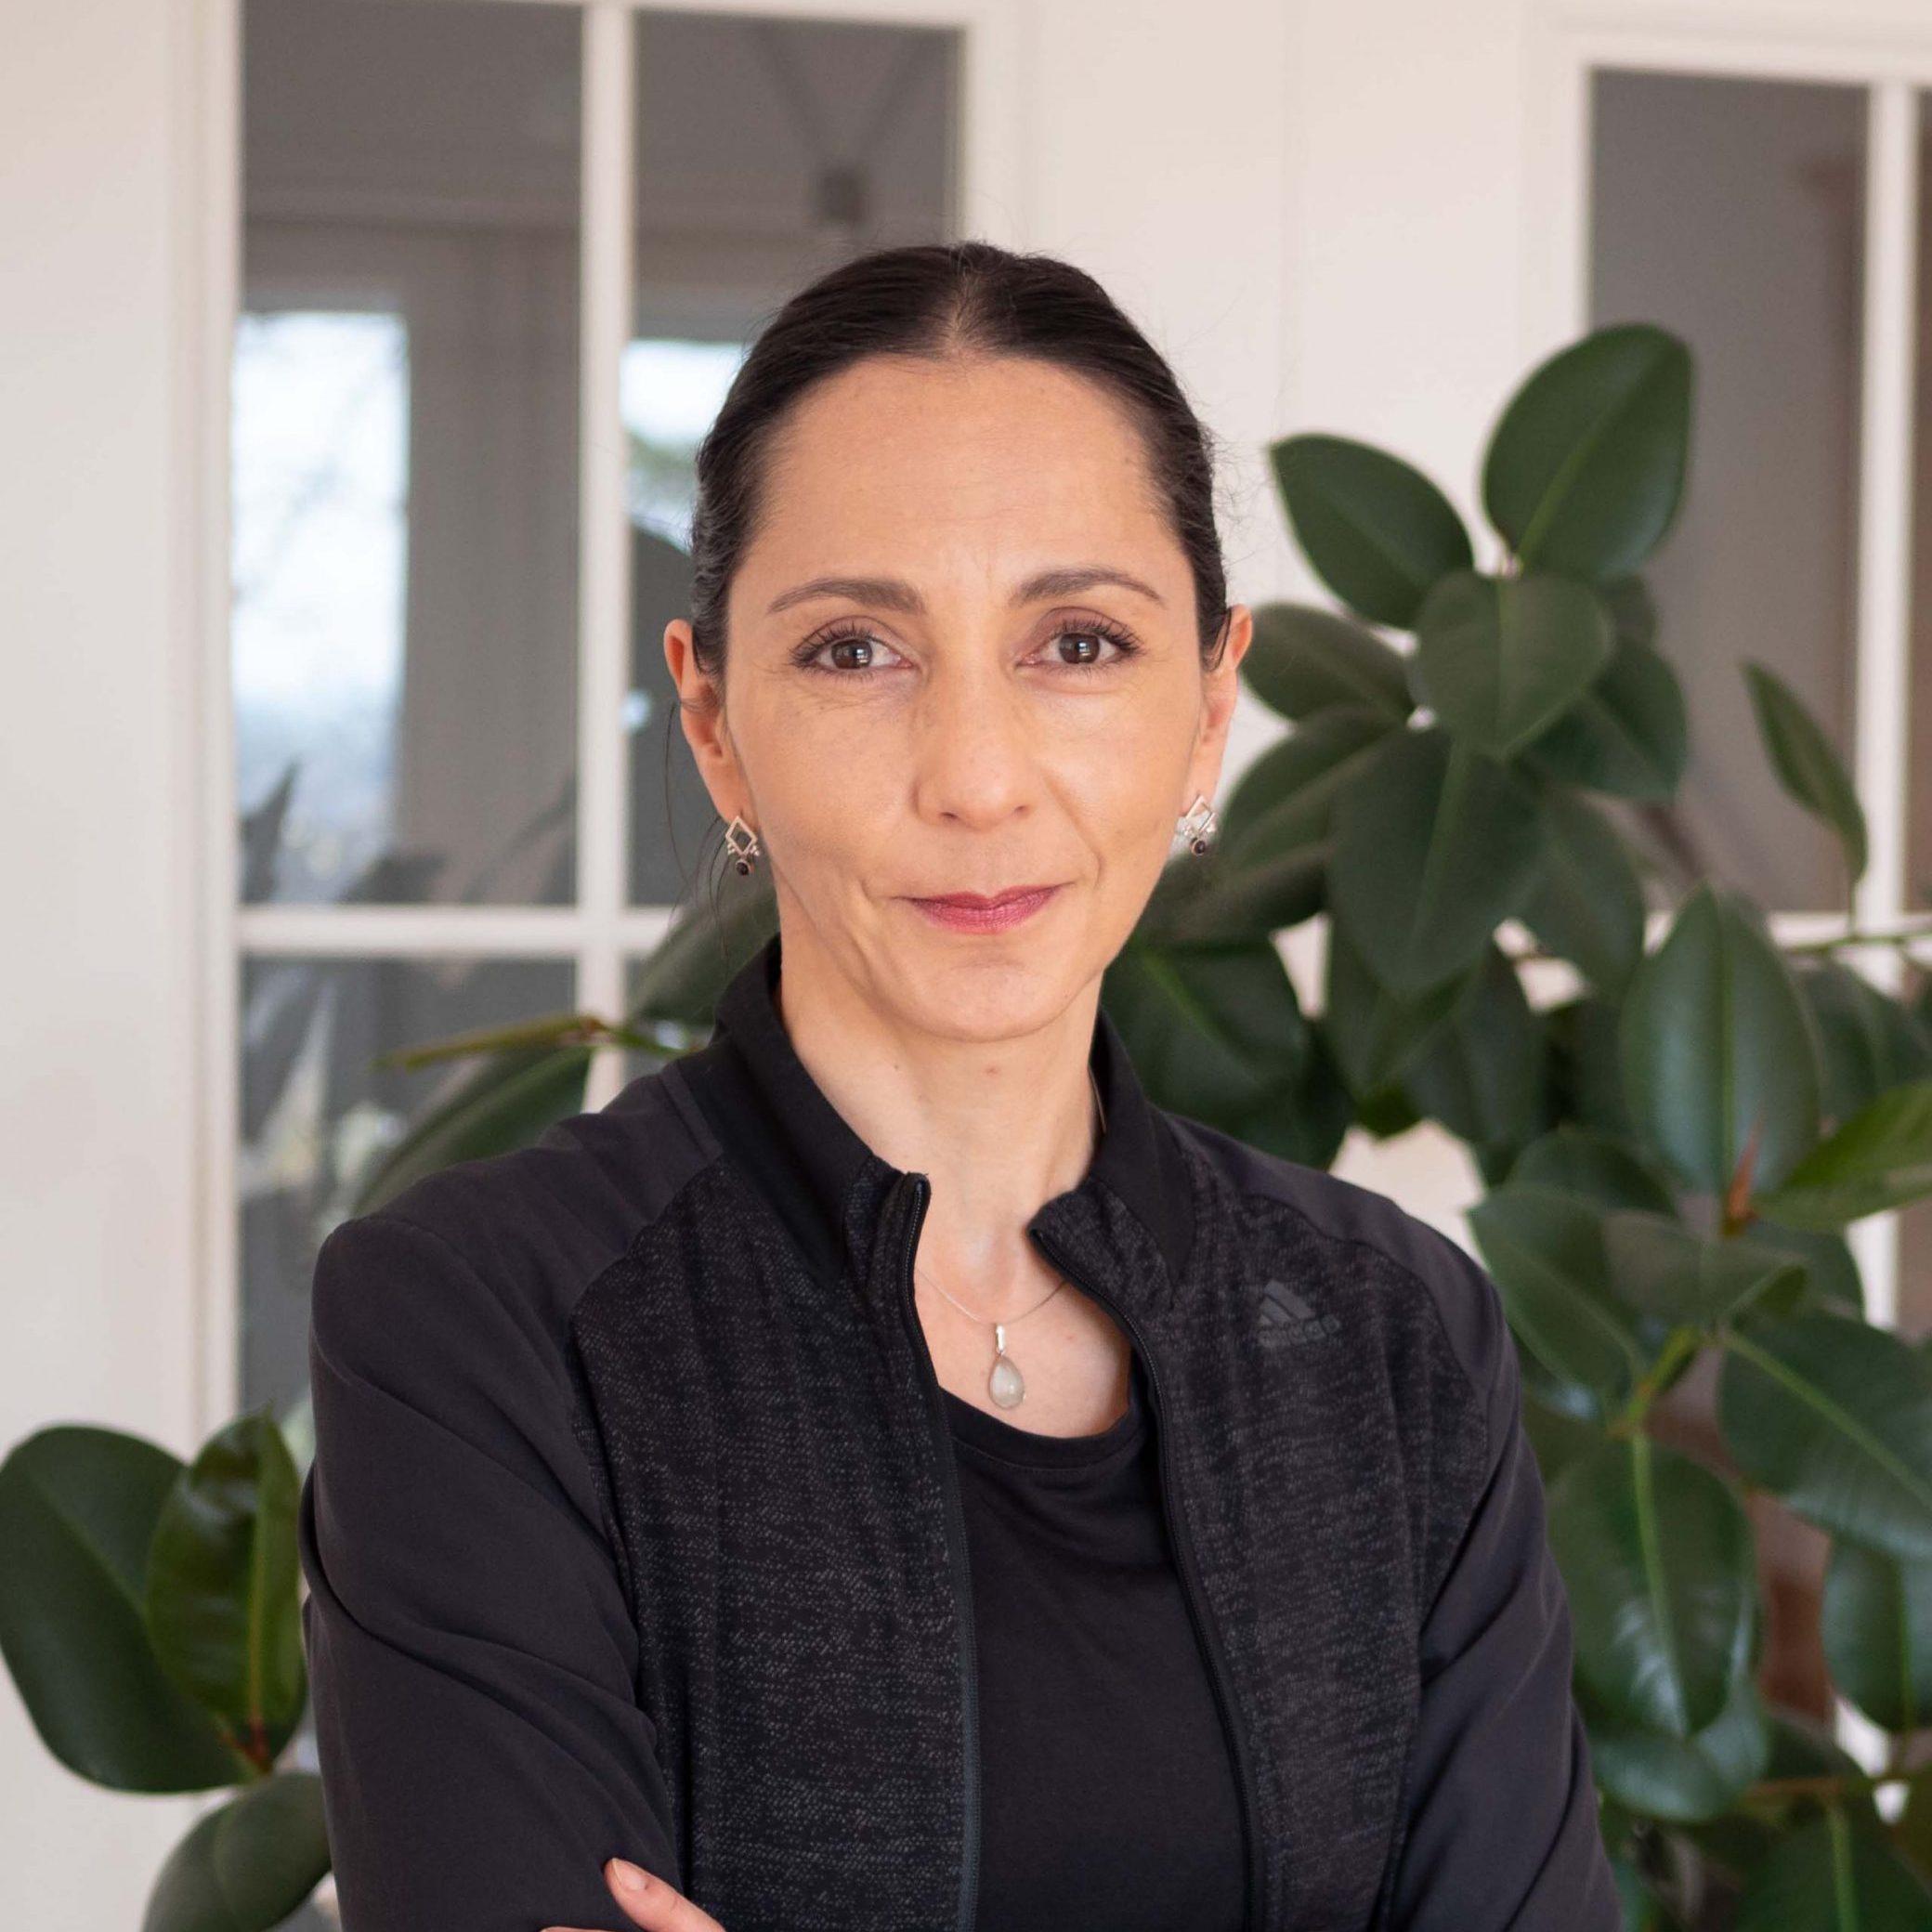 Mariana Toledo-Lorber